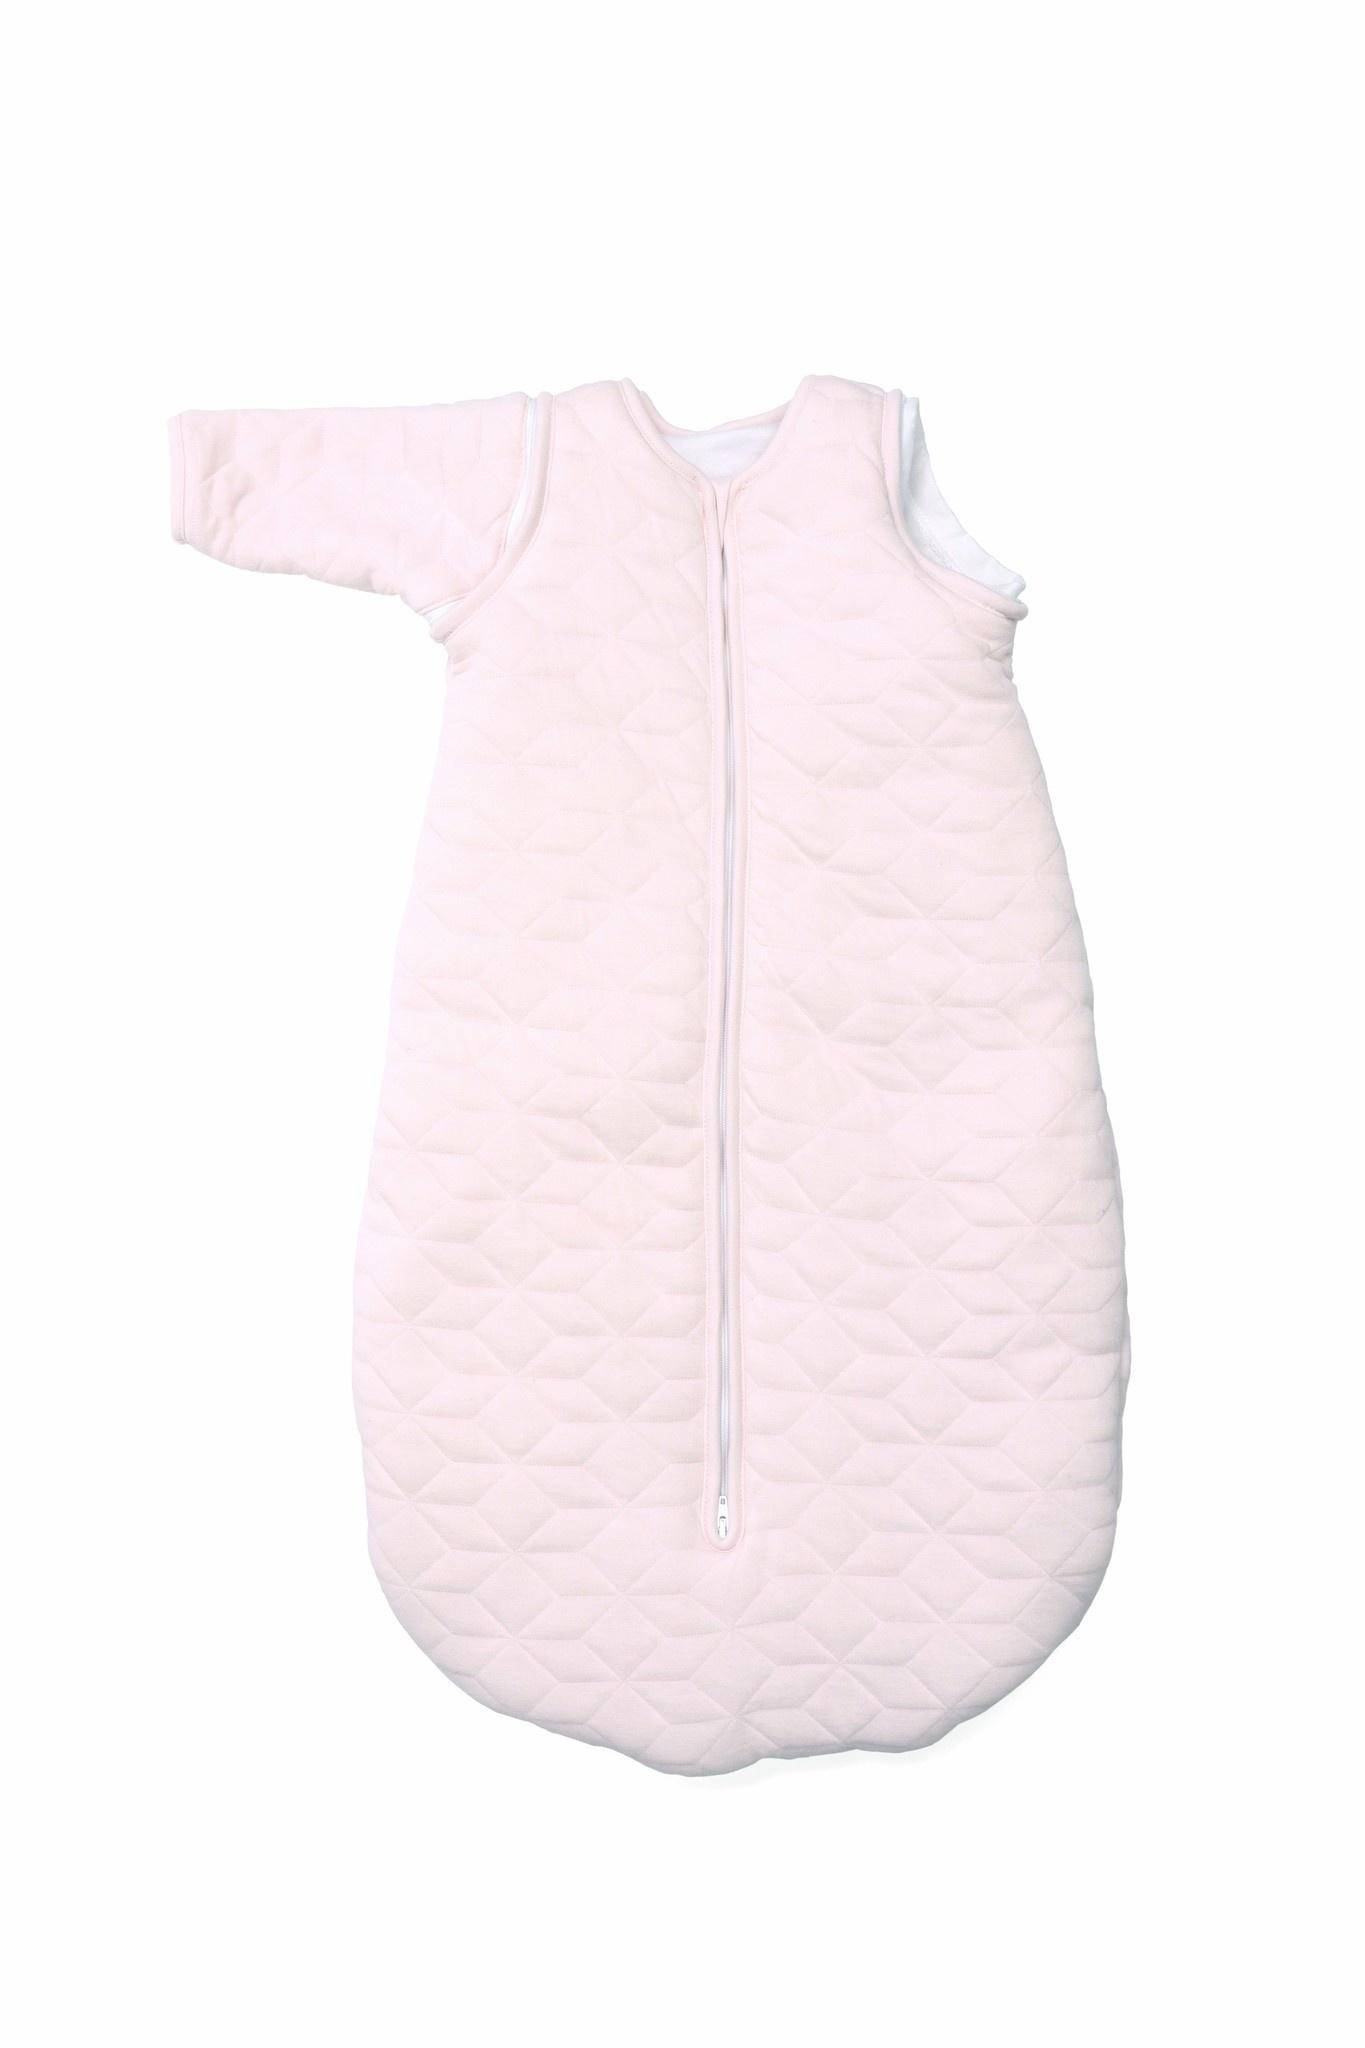 Jersey slaapzak 90cm met afritsbare mouwen Star Soft Pink-7